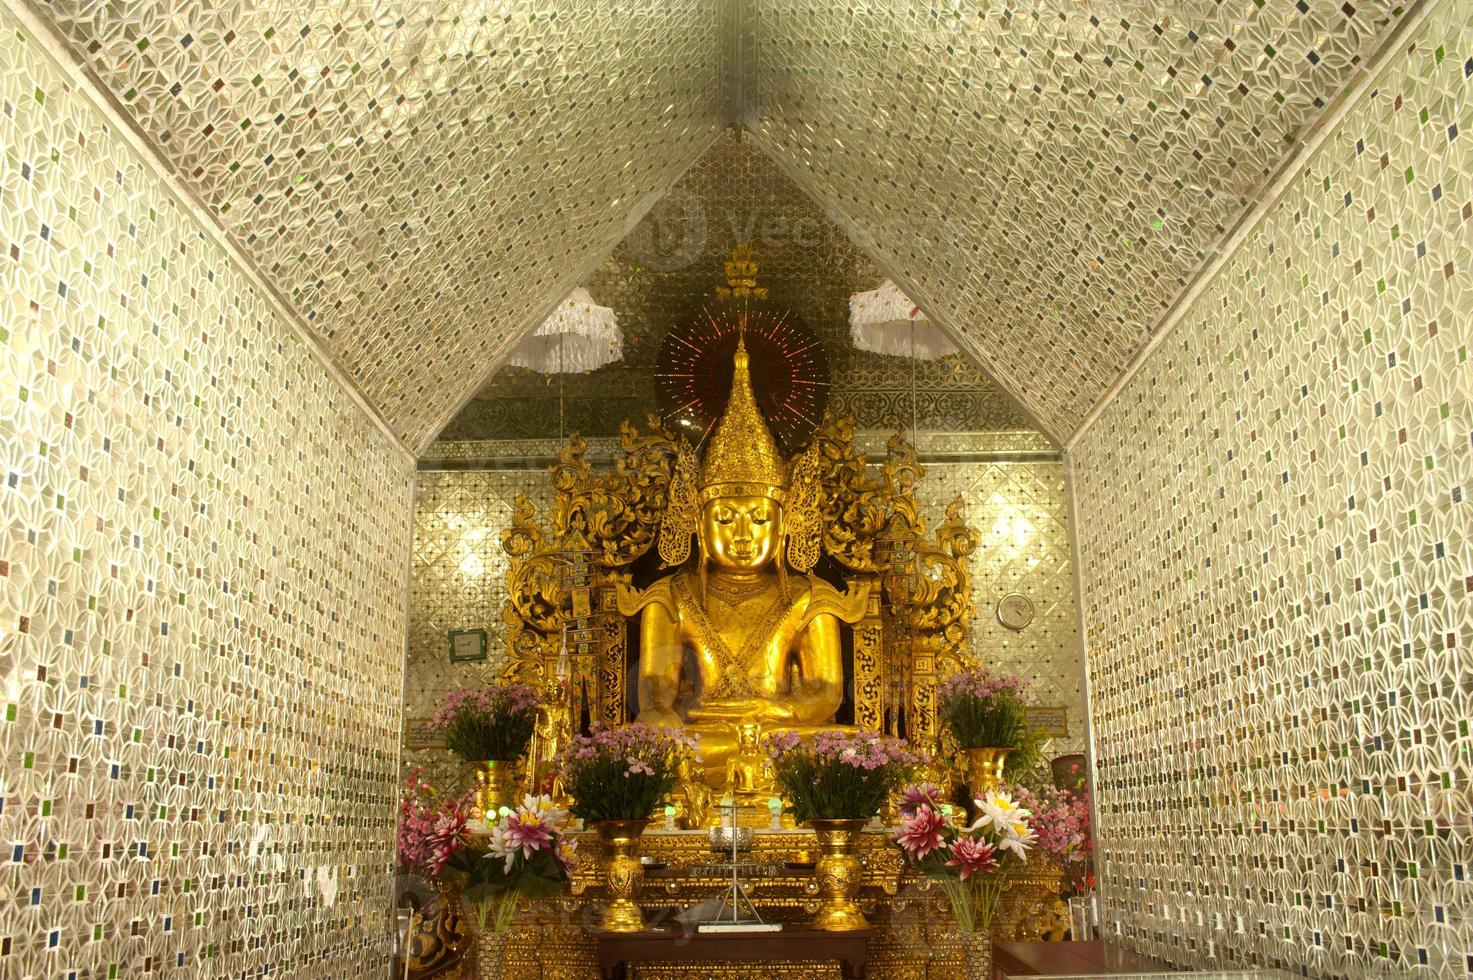 gouden Boeddha op pagode in sanda muni paya, myanmar. foto